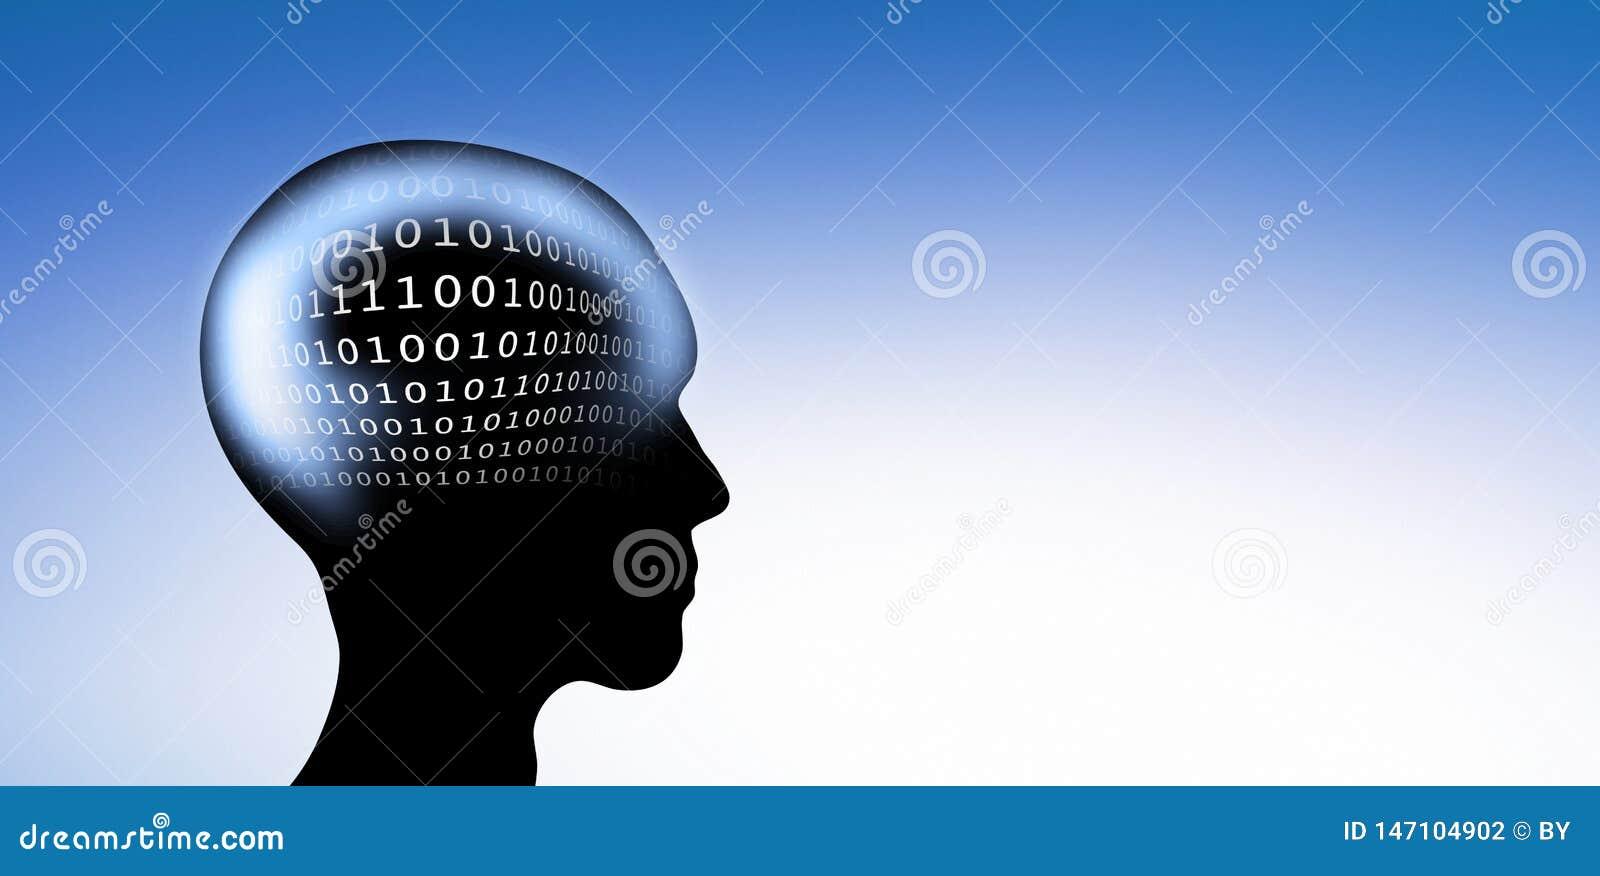 Digital-Code im Kopf